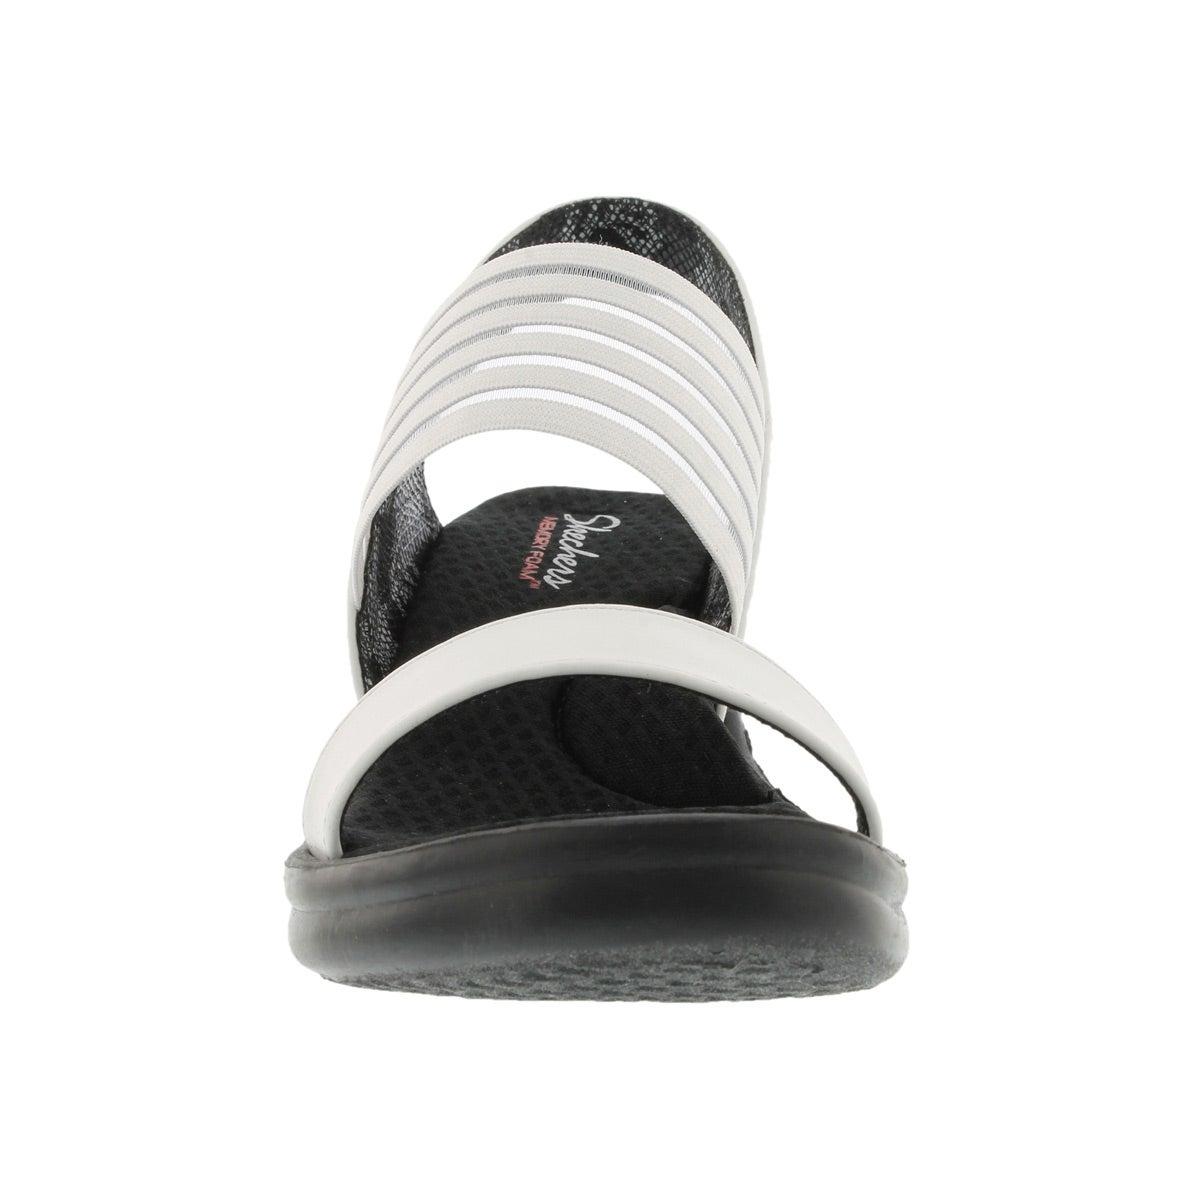 Lds Sci-fi wht sling back wedge sandal